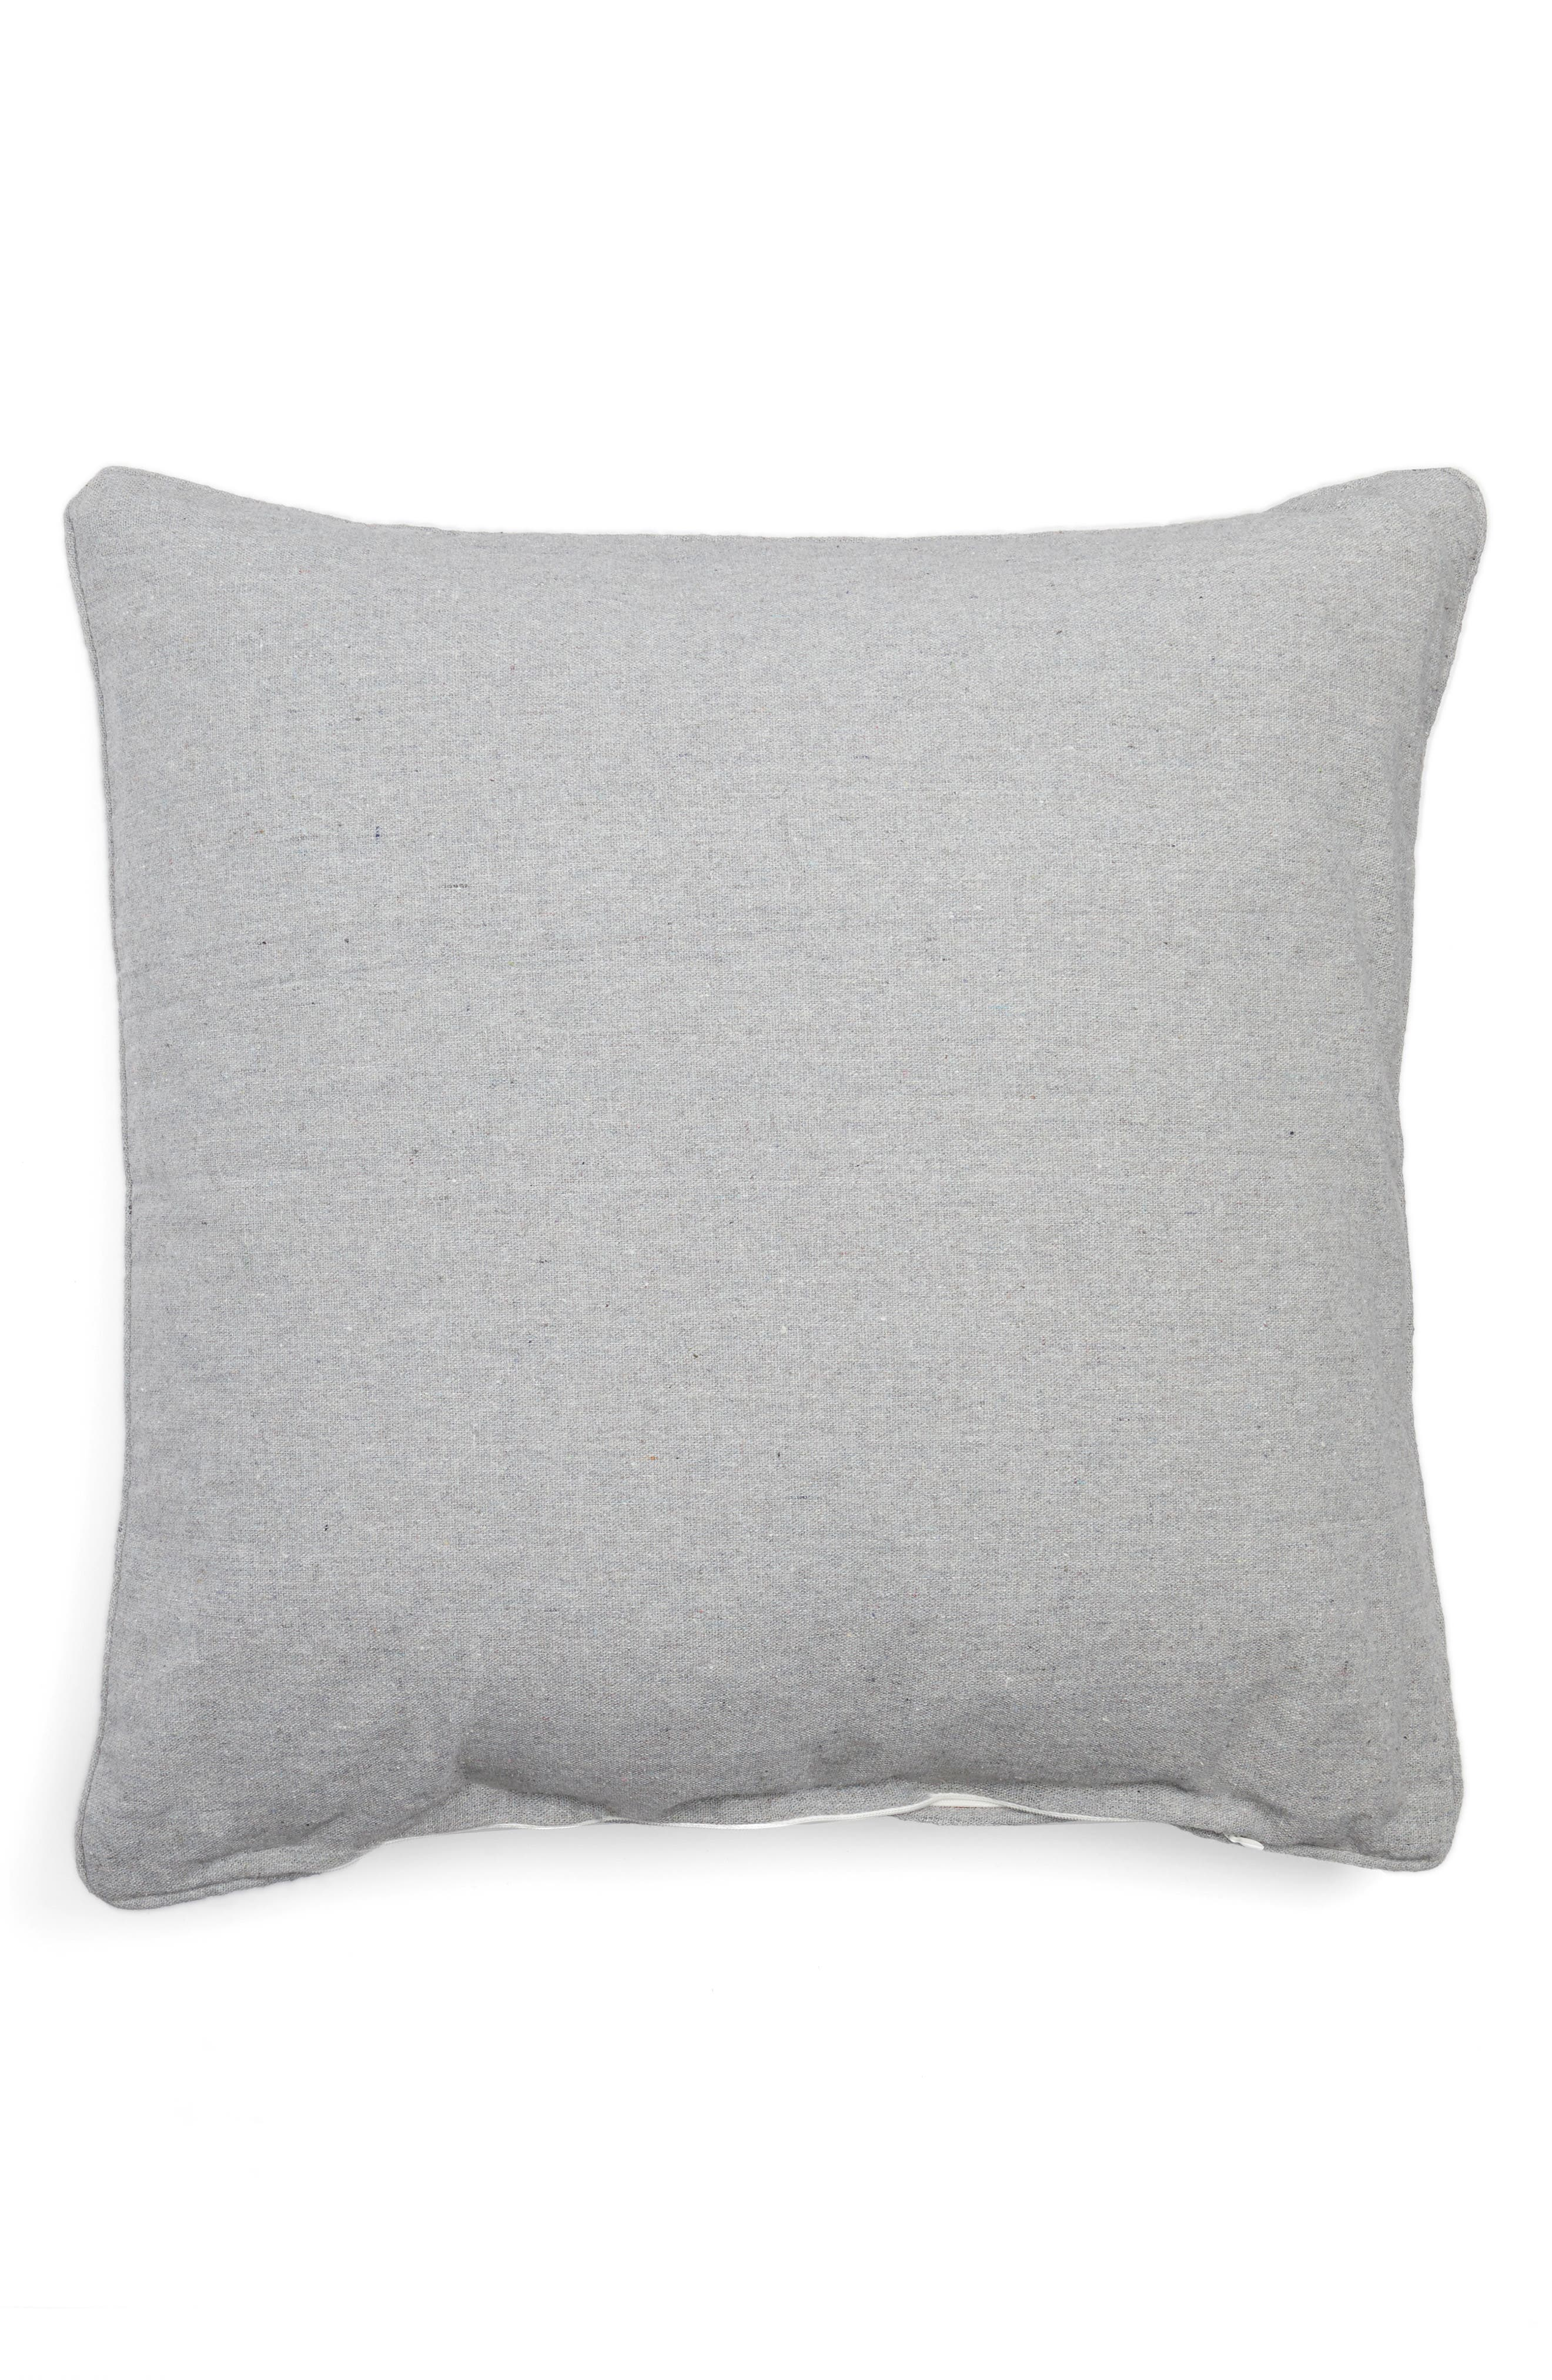 Alternate Image 2  - Levtex Nala Towel Stitch Accent Pillow